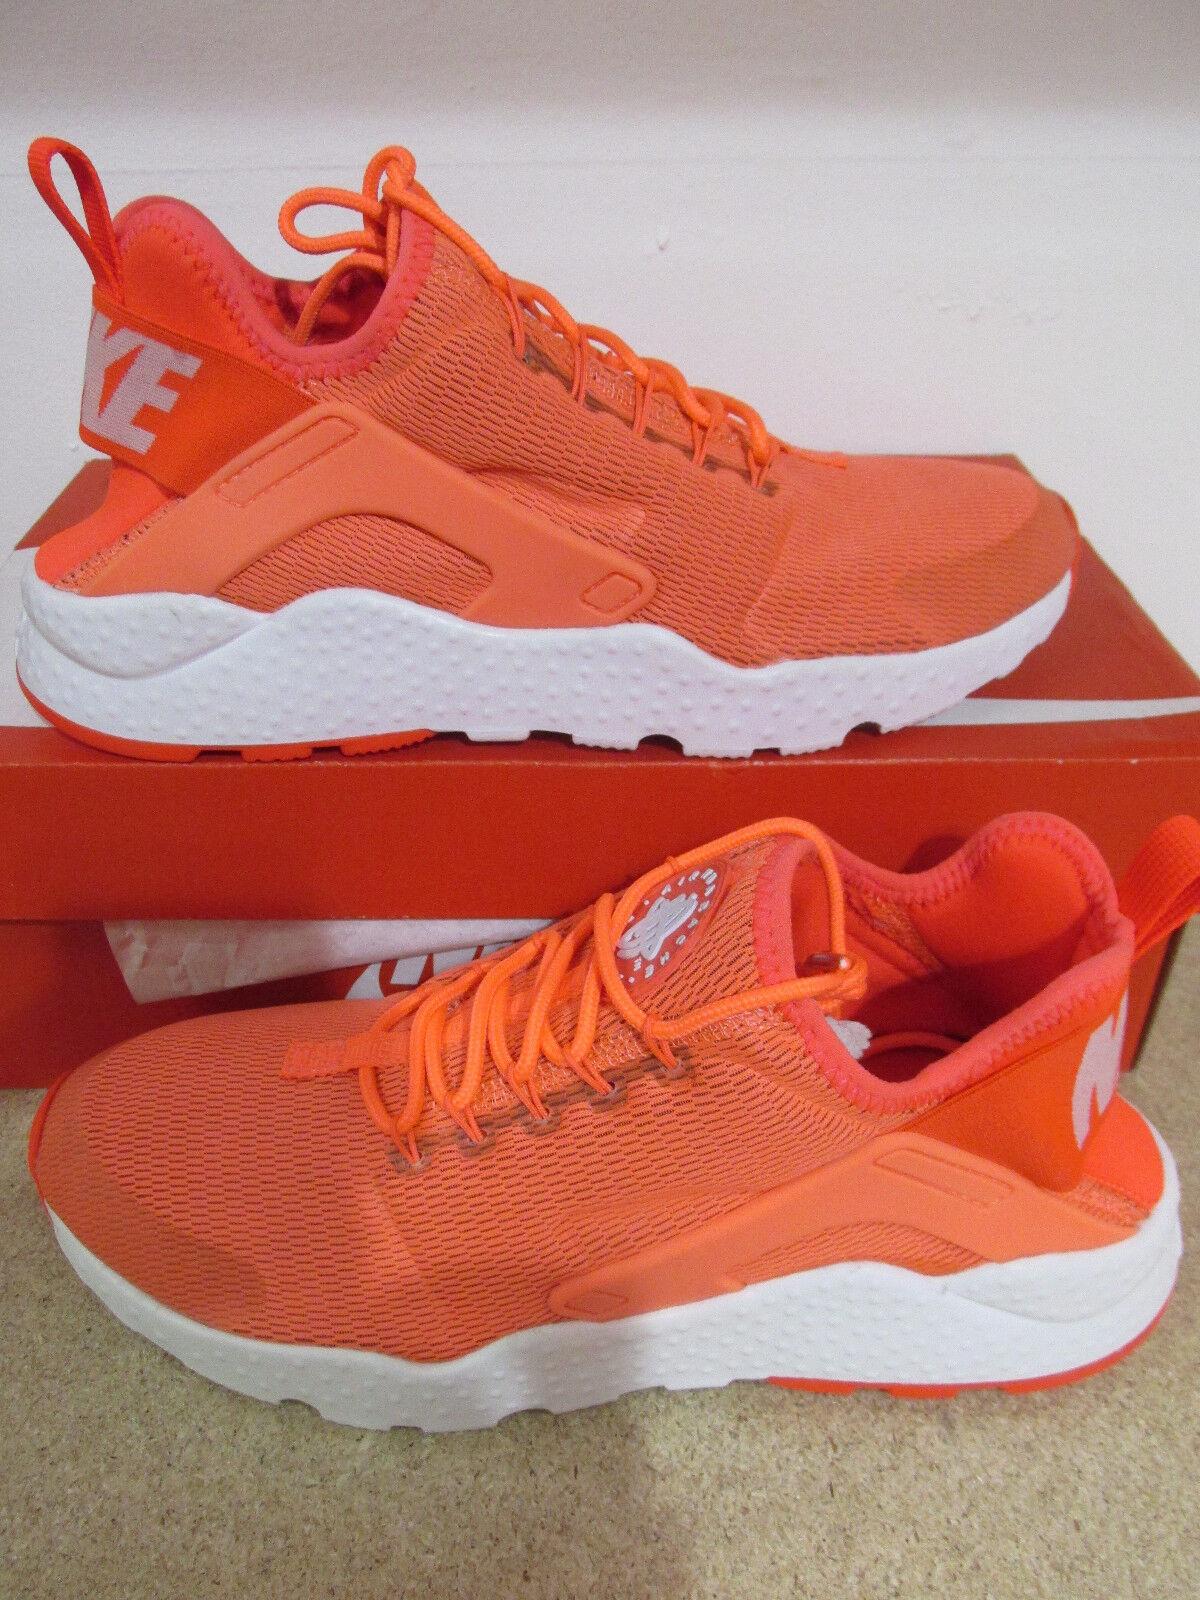 Nike Wo Hommes Air Huarache Run Ultra Running Trainers 819151 819151 Trainers 800 Baskets Chaussures bd7cfd